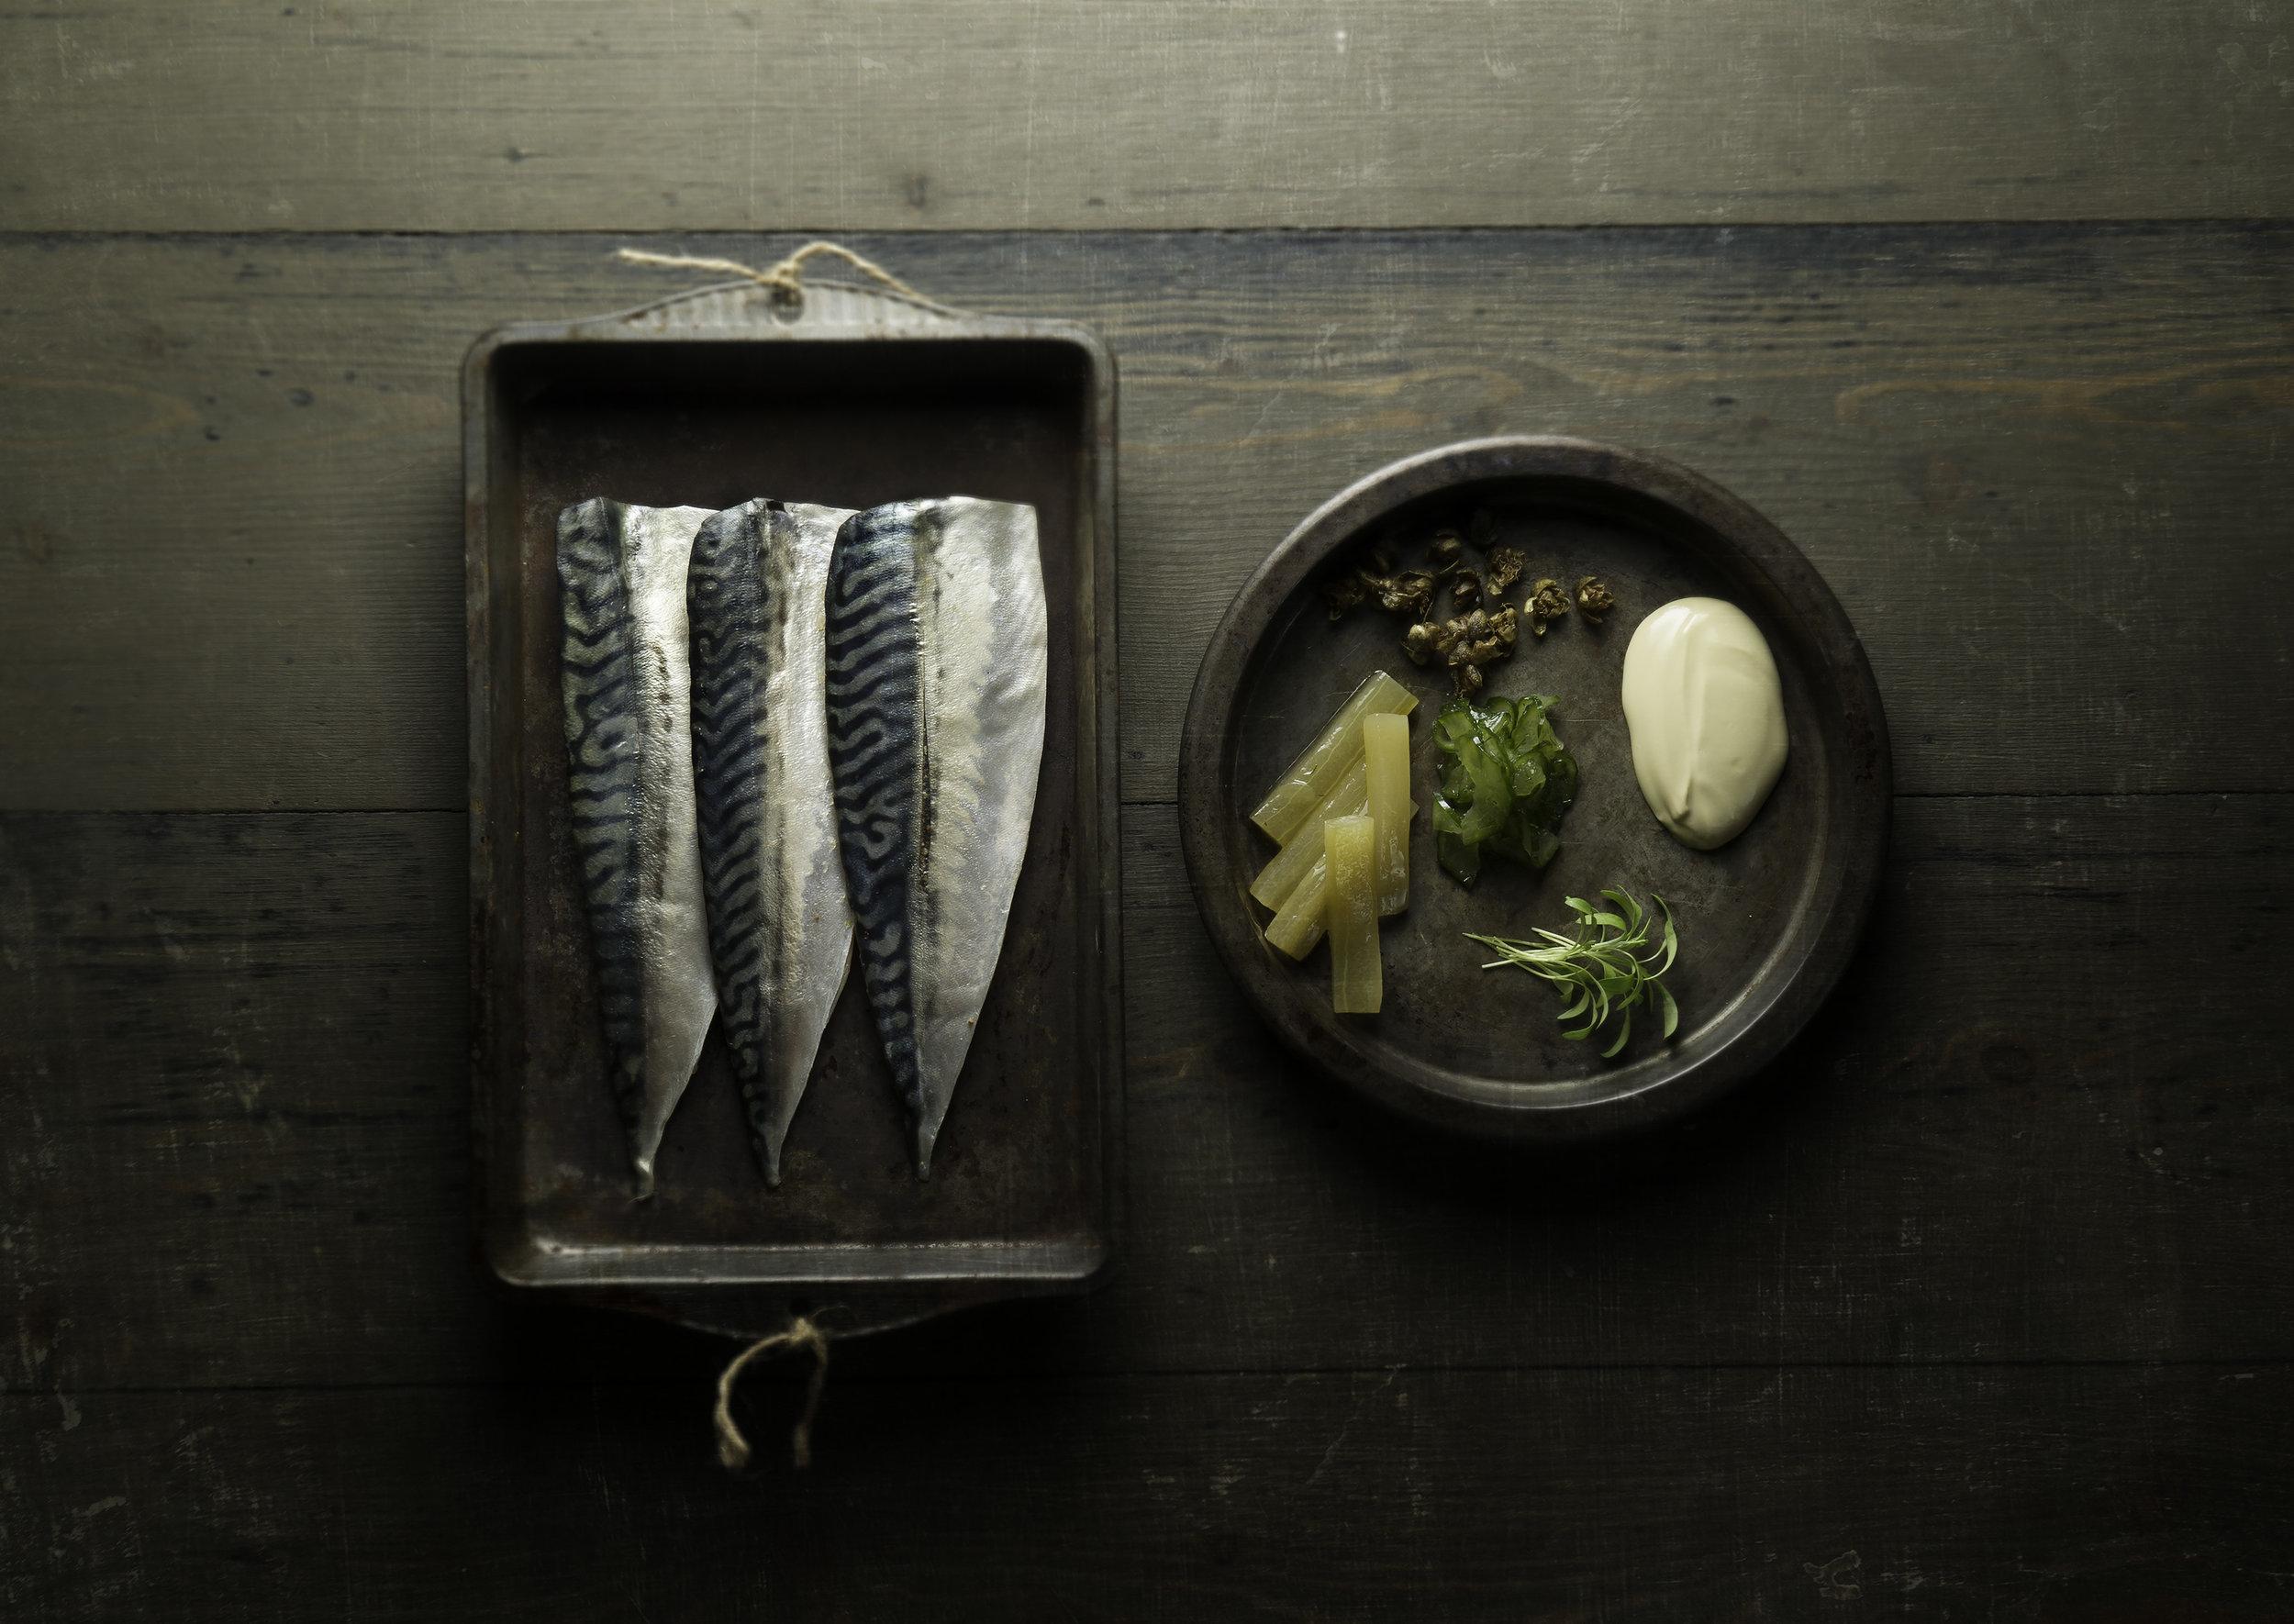 Pickled mackerel - - The Miller of Mansfield